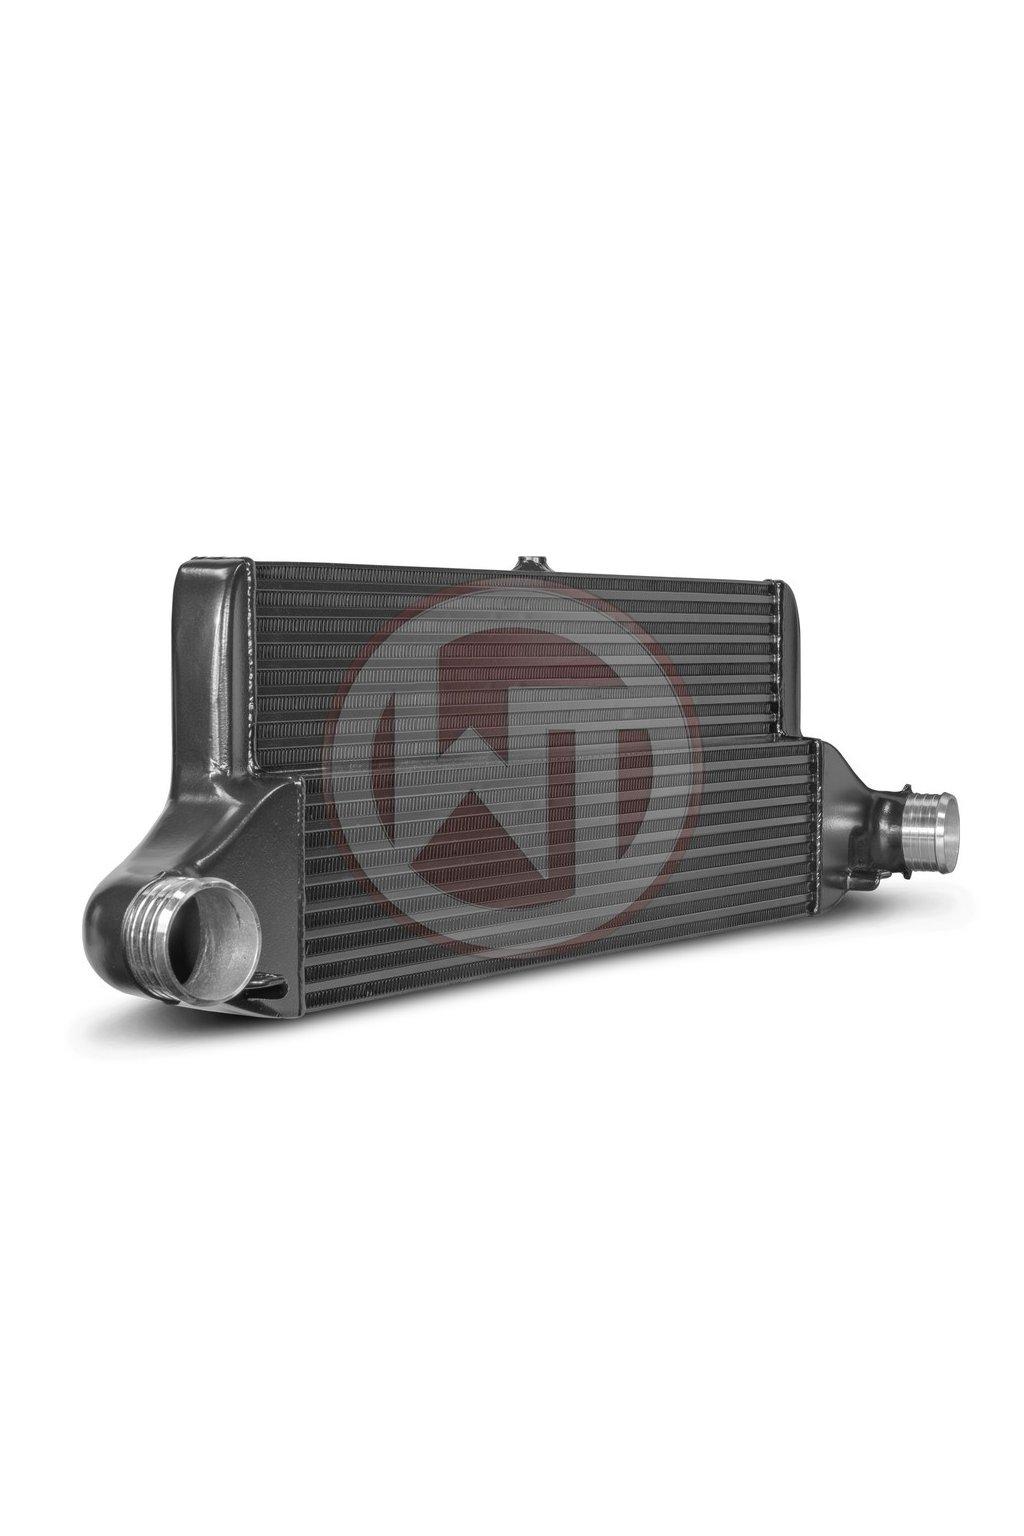 Wagner Tuning intercooler kit Ford Fiesta ST mk7